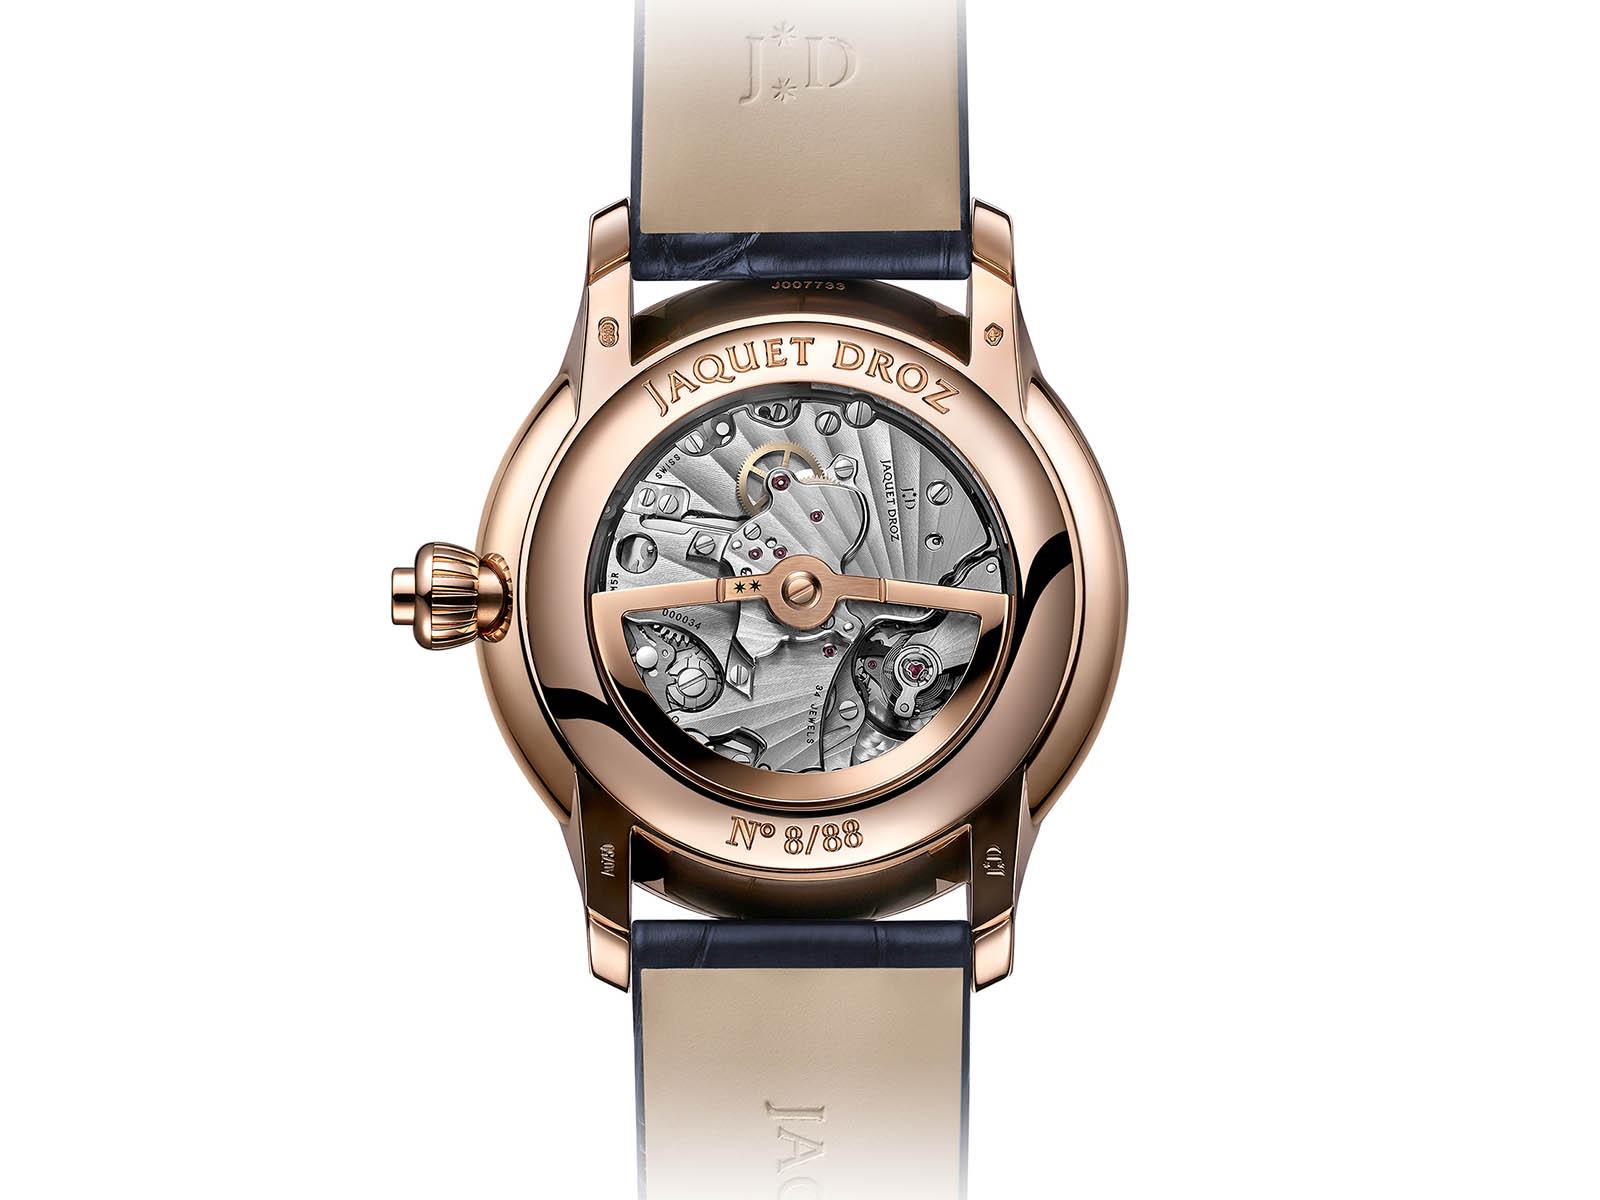 j007733200-jaquet-droz-grande-seconde-chronograph-ivory-enamel-2.jpg